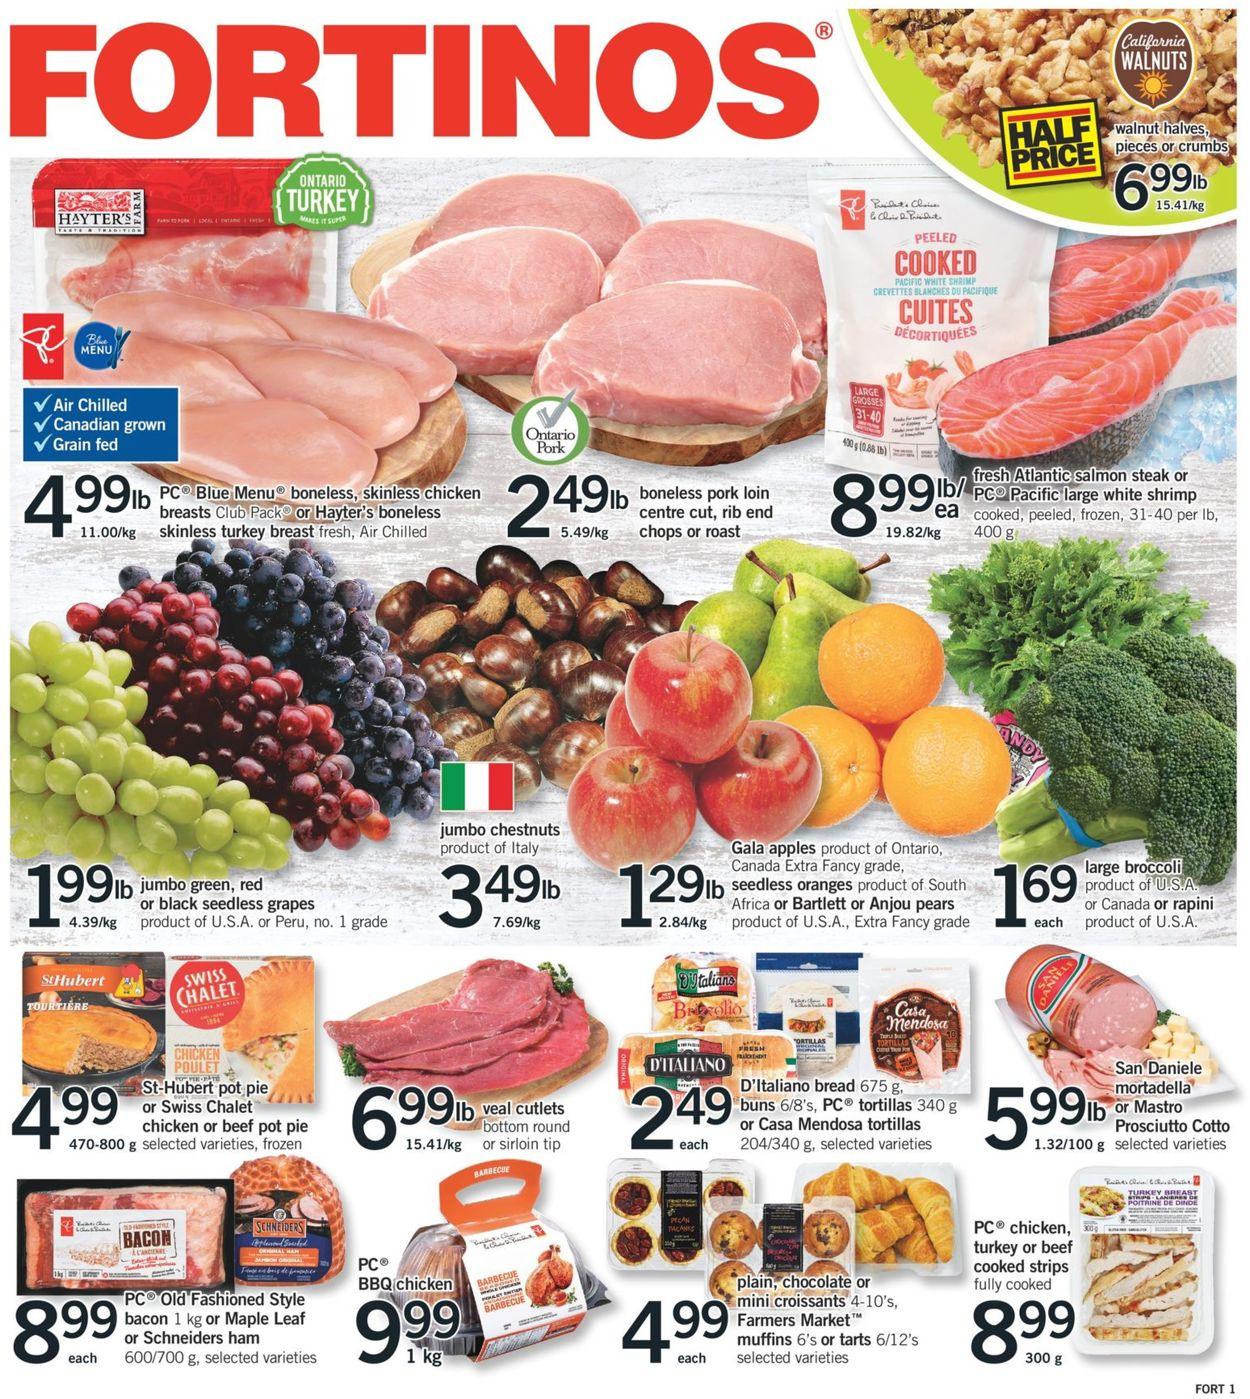 Fortinos Flyer - 11/12-11/18/2020